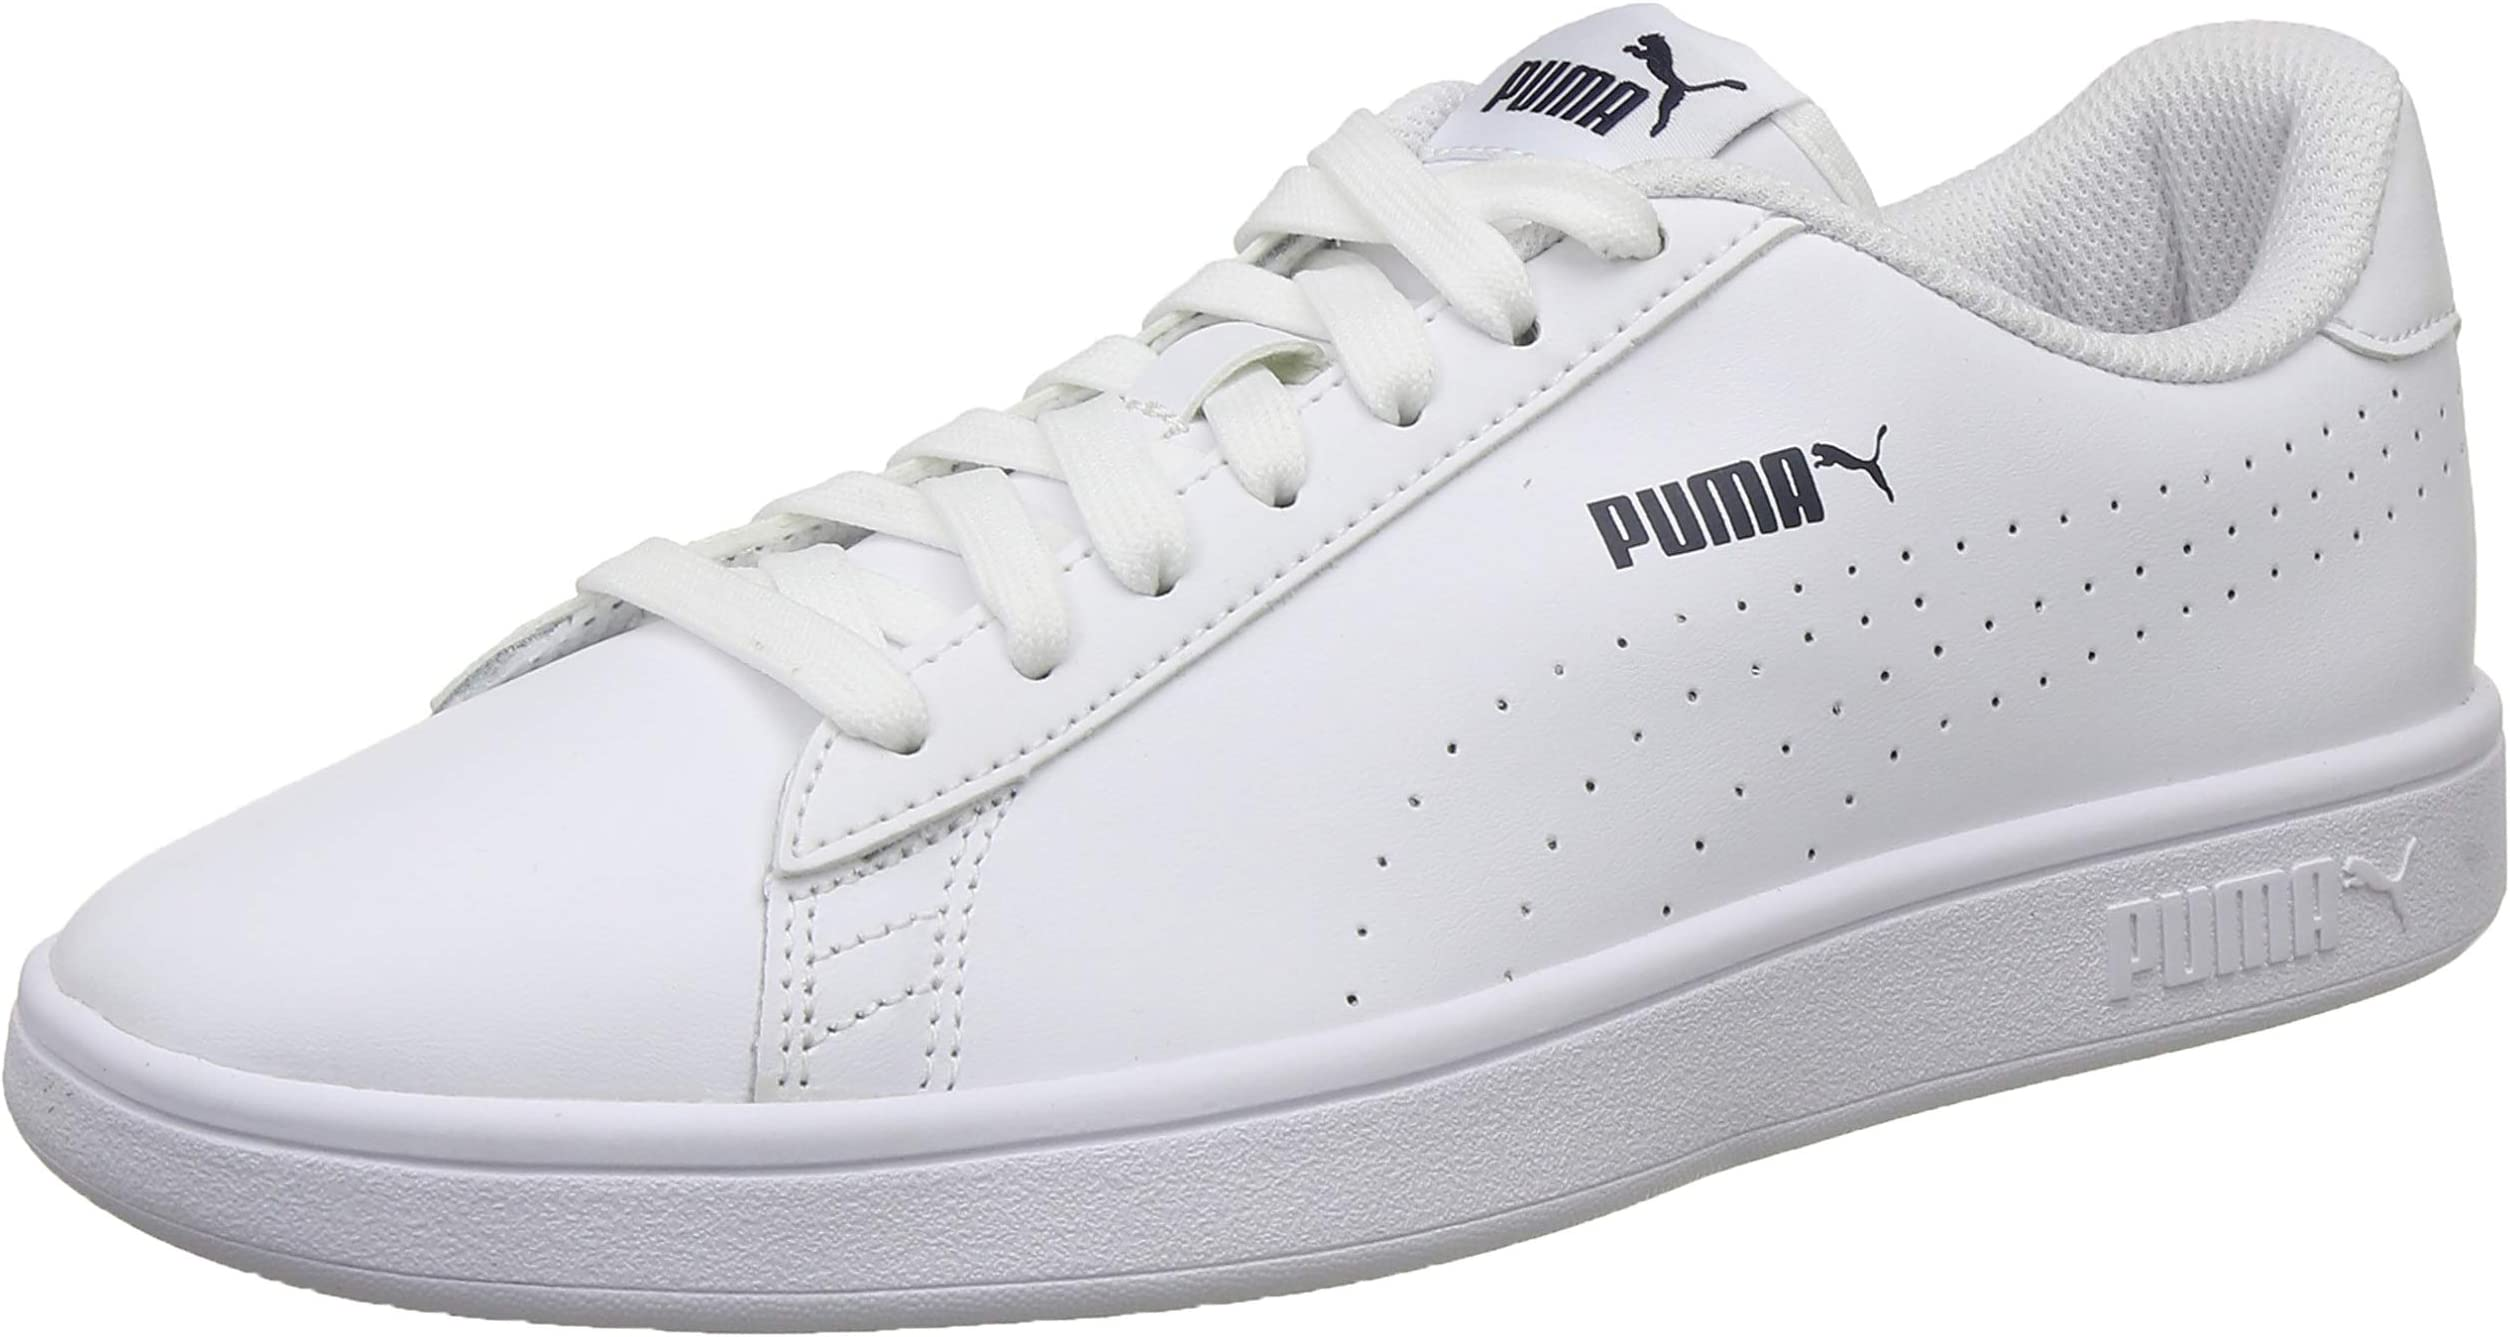 PUMA Puma Smash V2 L Perf Unisex Adults